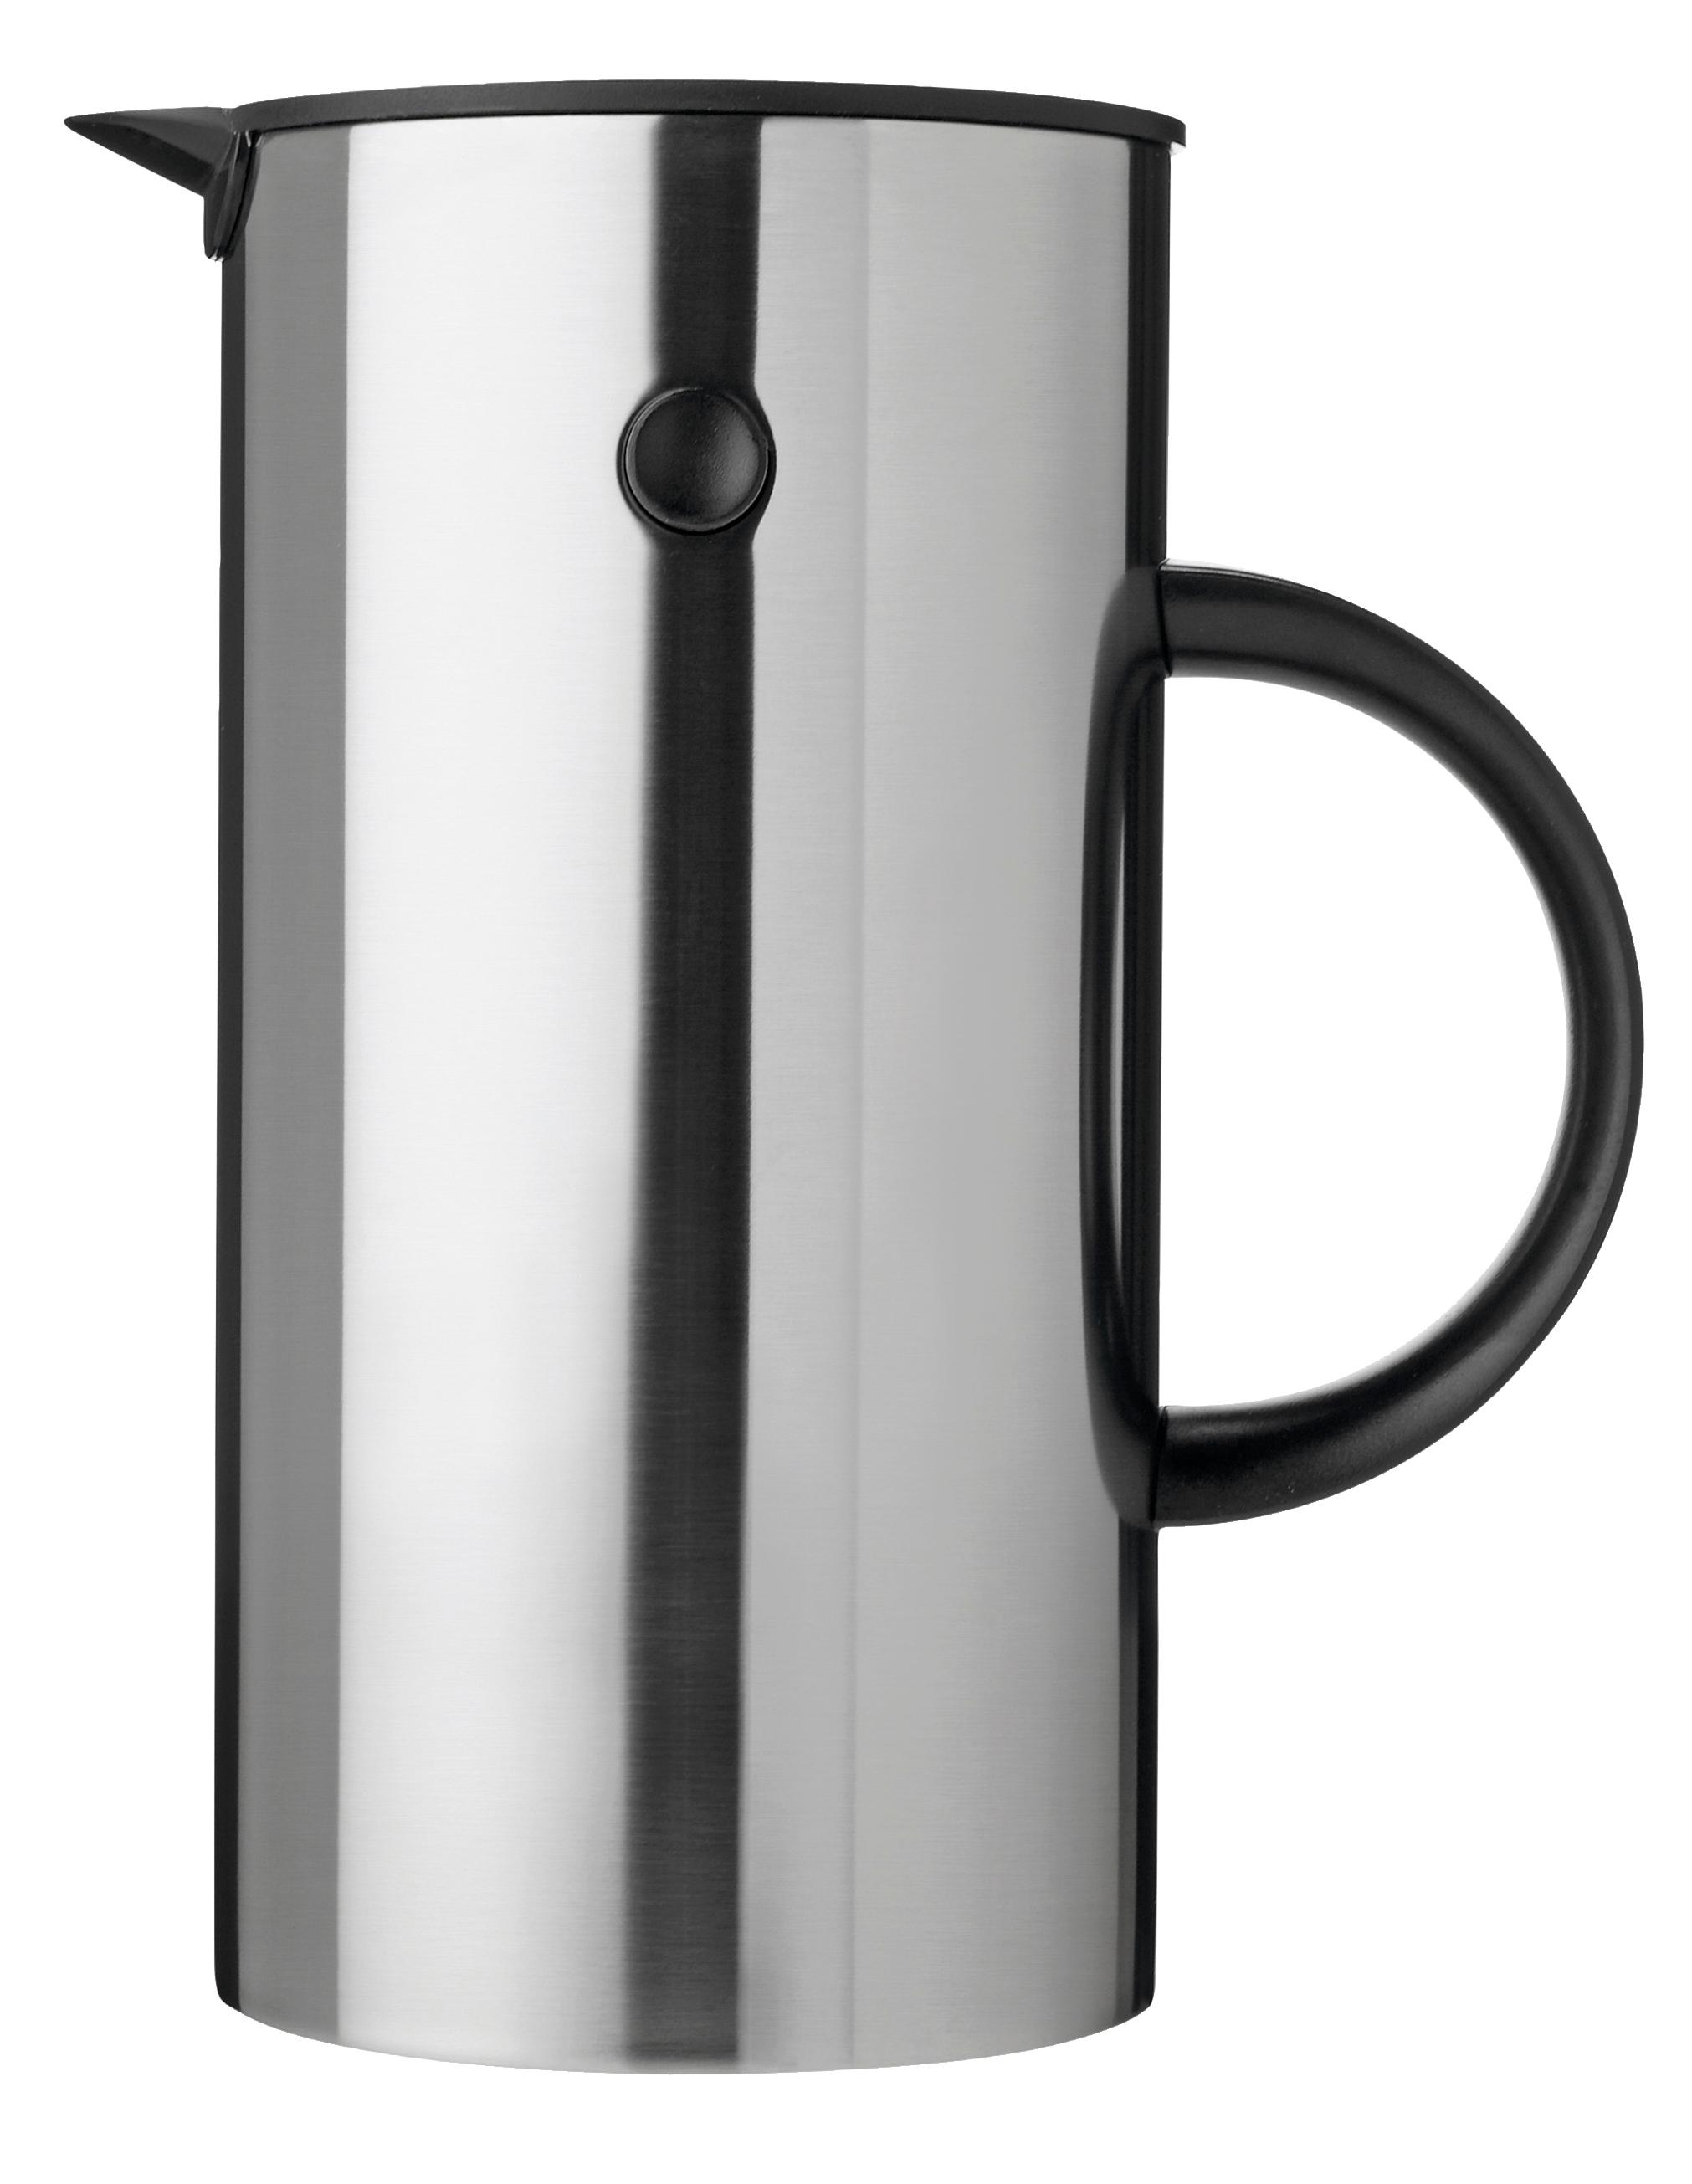 Em Press Coffee Maker Stainless Steel : Stelton EM French Press Coffee Maker - GR Shop Canada